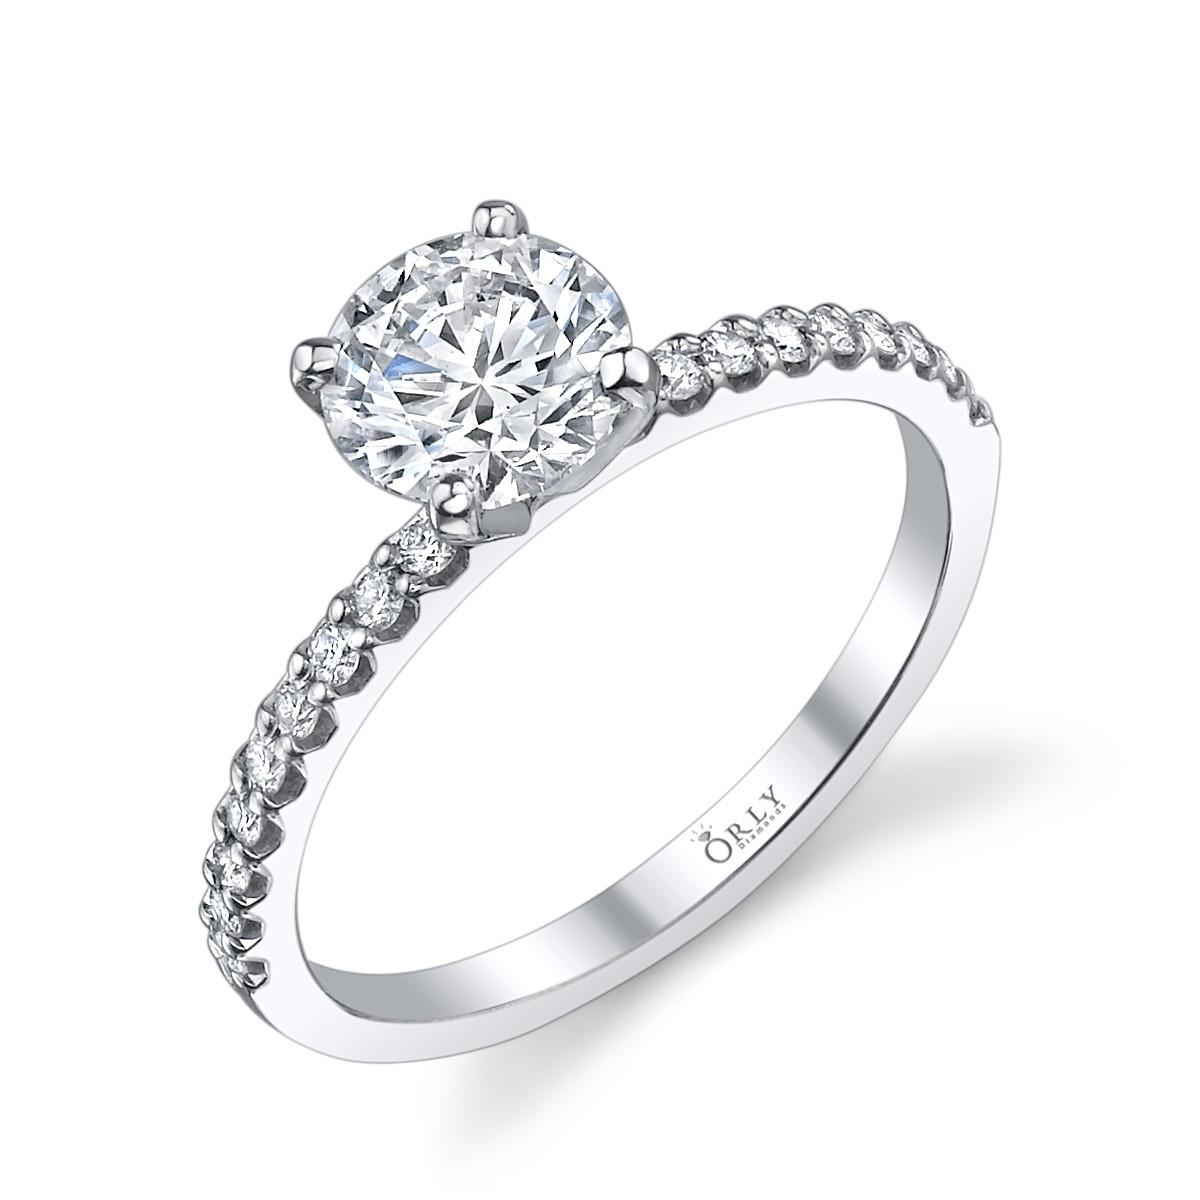 Round Brilliant Cut Diamond in Elegance Setting 1.18 carats tw